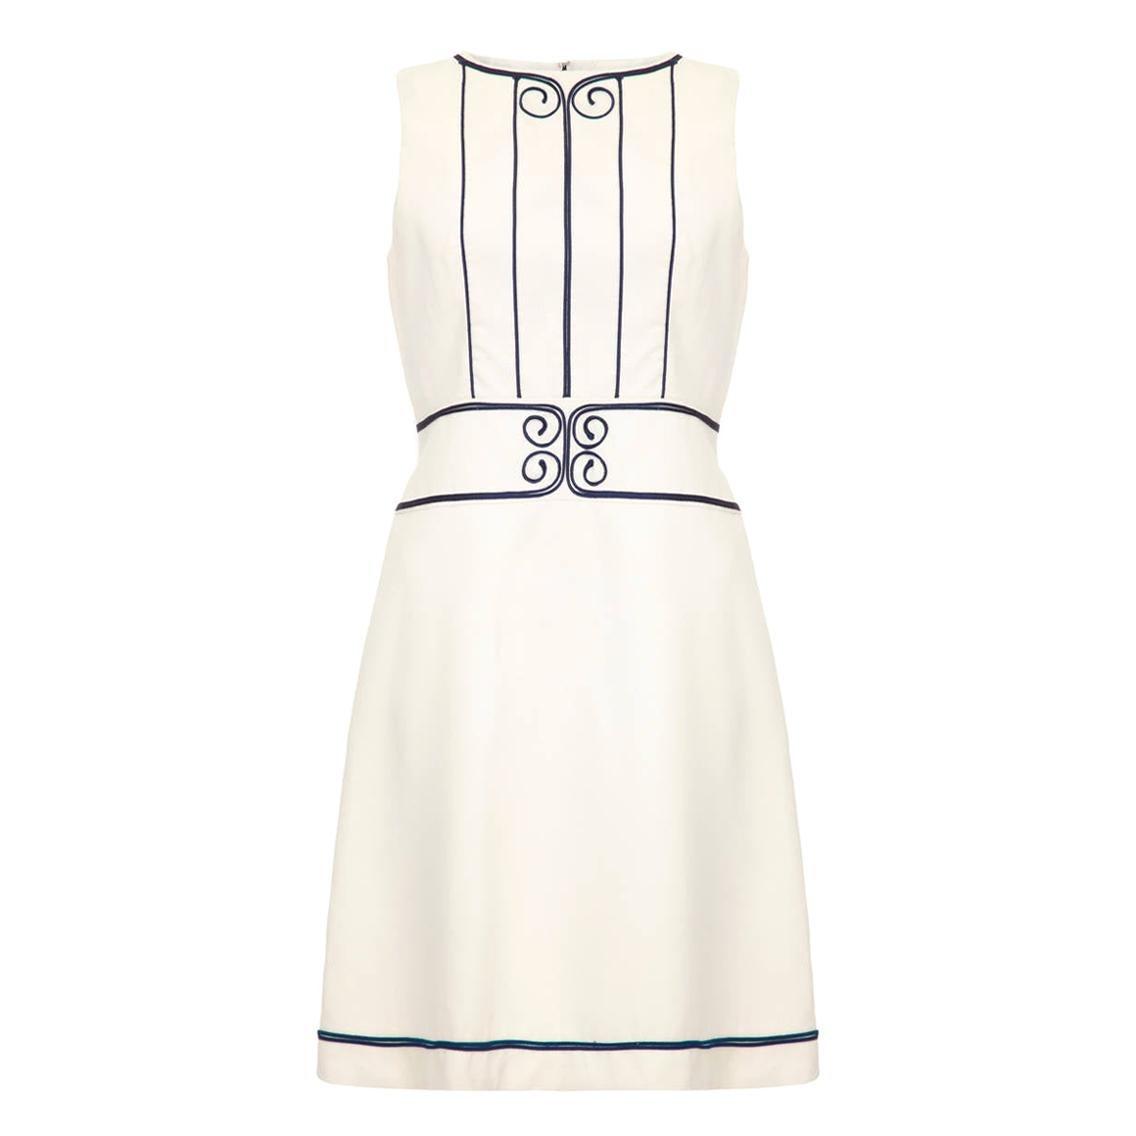 1960s Louis Feraud For Rembrandt White Mini Dress With Navy Appliqué